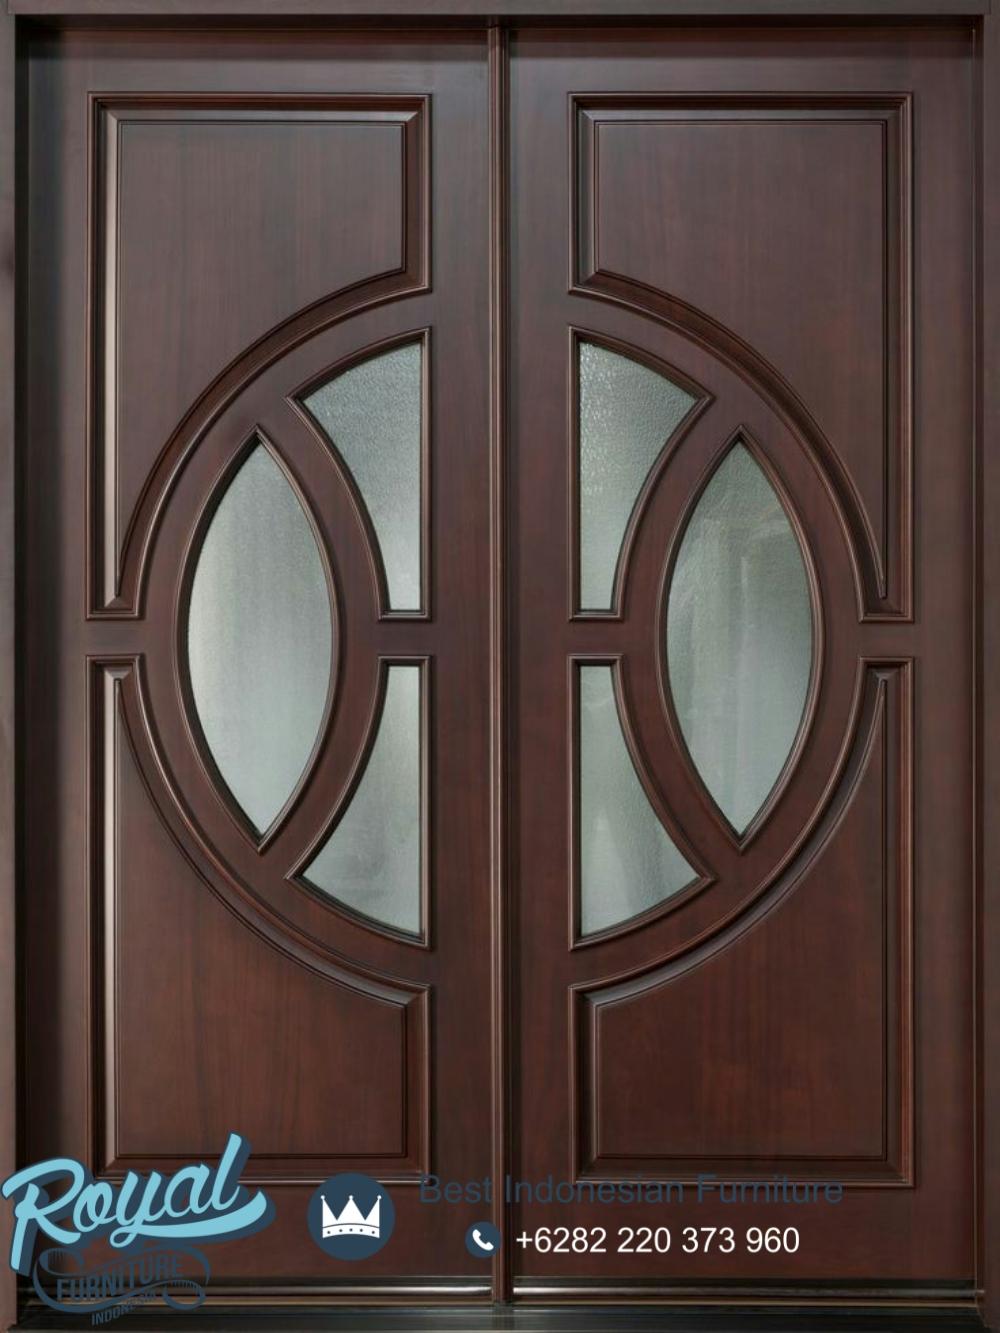 Pintu Kusen Kayu Jati Minimalis Jepara Terbaru, pintu kupu tarung jati, model pintu kupu tarung kayu jati, pintu kupu tarung mewah, gambar pintu kupu tarung terbaru, model pintu kupu tarung klasik, pintu dan kusen kupu tarung minimalis, model pintu jepara, pintu jati jepara, pintu jepara minimalis, harga pintu jepara, model kusen pintu jepara, model pintu jepara terbaru, kusen pintu klasik, pintu kayu jati mewah, harga kusen pintu jati jepara, harga kusen jati, harga pintu kayu jati 2020, harga kusen jati tua, harga pintu jati 2 pintu, harga kusen 2 pintu mewah, kusen pintu kayu jati kualitas terbaik, pintu jati minimalis terbaru, pintu jati jepara minimalis, pintu jati minimalis modern, pintu kayu jati mewah, pintu dan kusen utama, model pintu minimalis kayu jati, model pintu minimalis elegan, kusen jendela jati jepara, desain pintu jati minimalis, model pintu kupu tarung, pintu kupu tarung jati, pintu kupu tarung minimalis terbaru, royal furniture